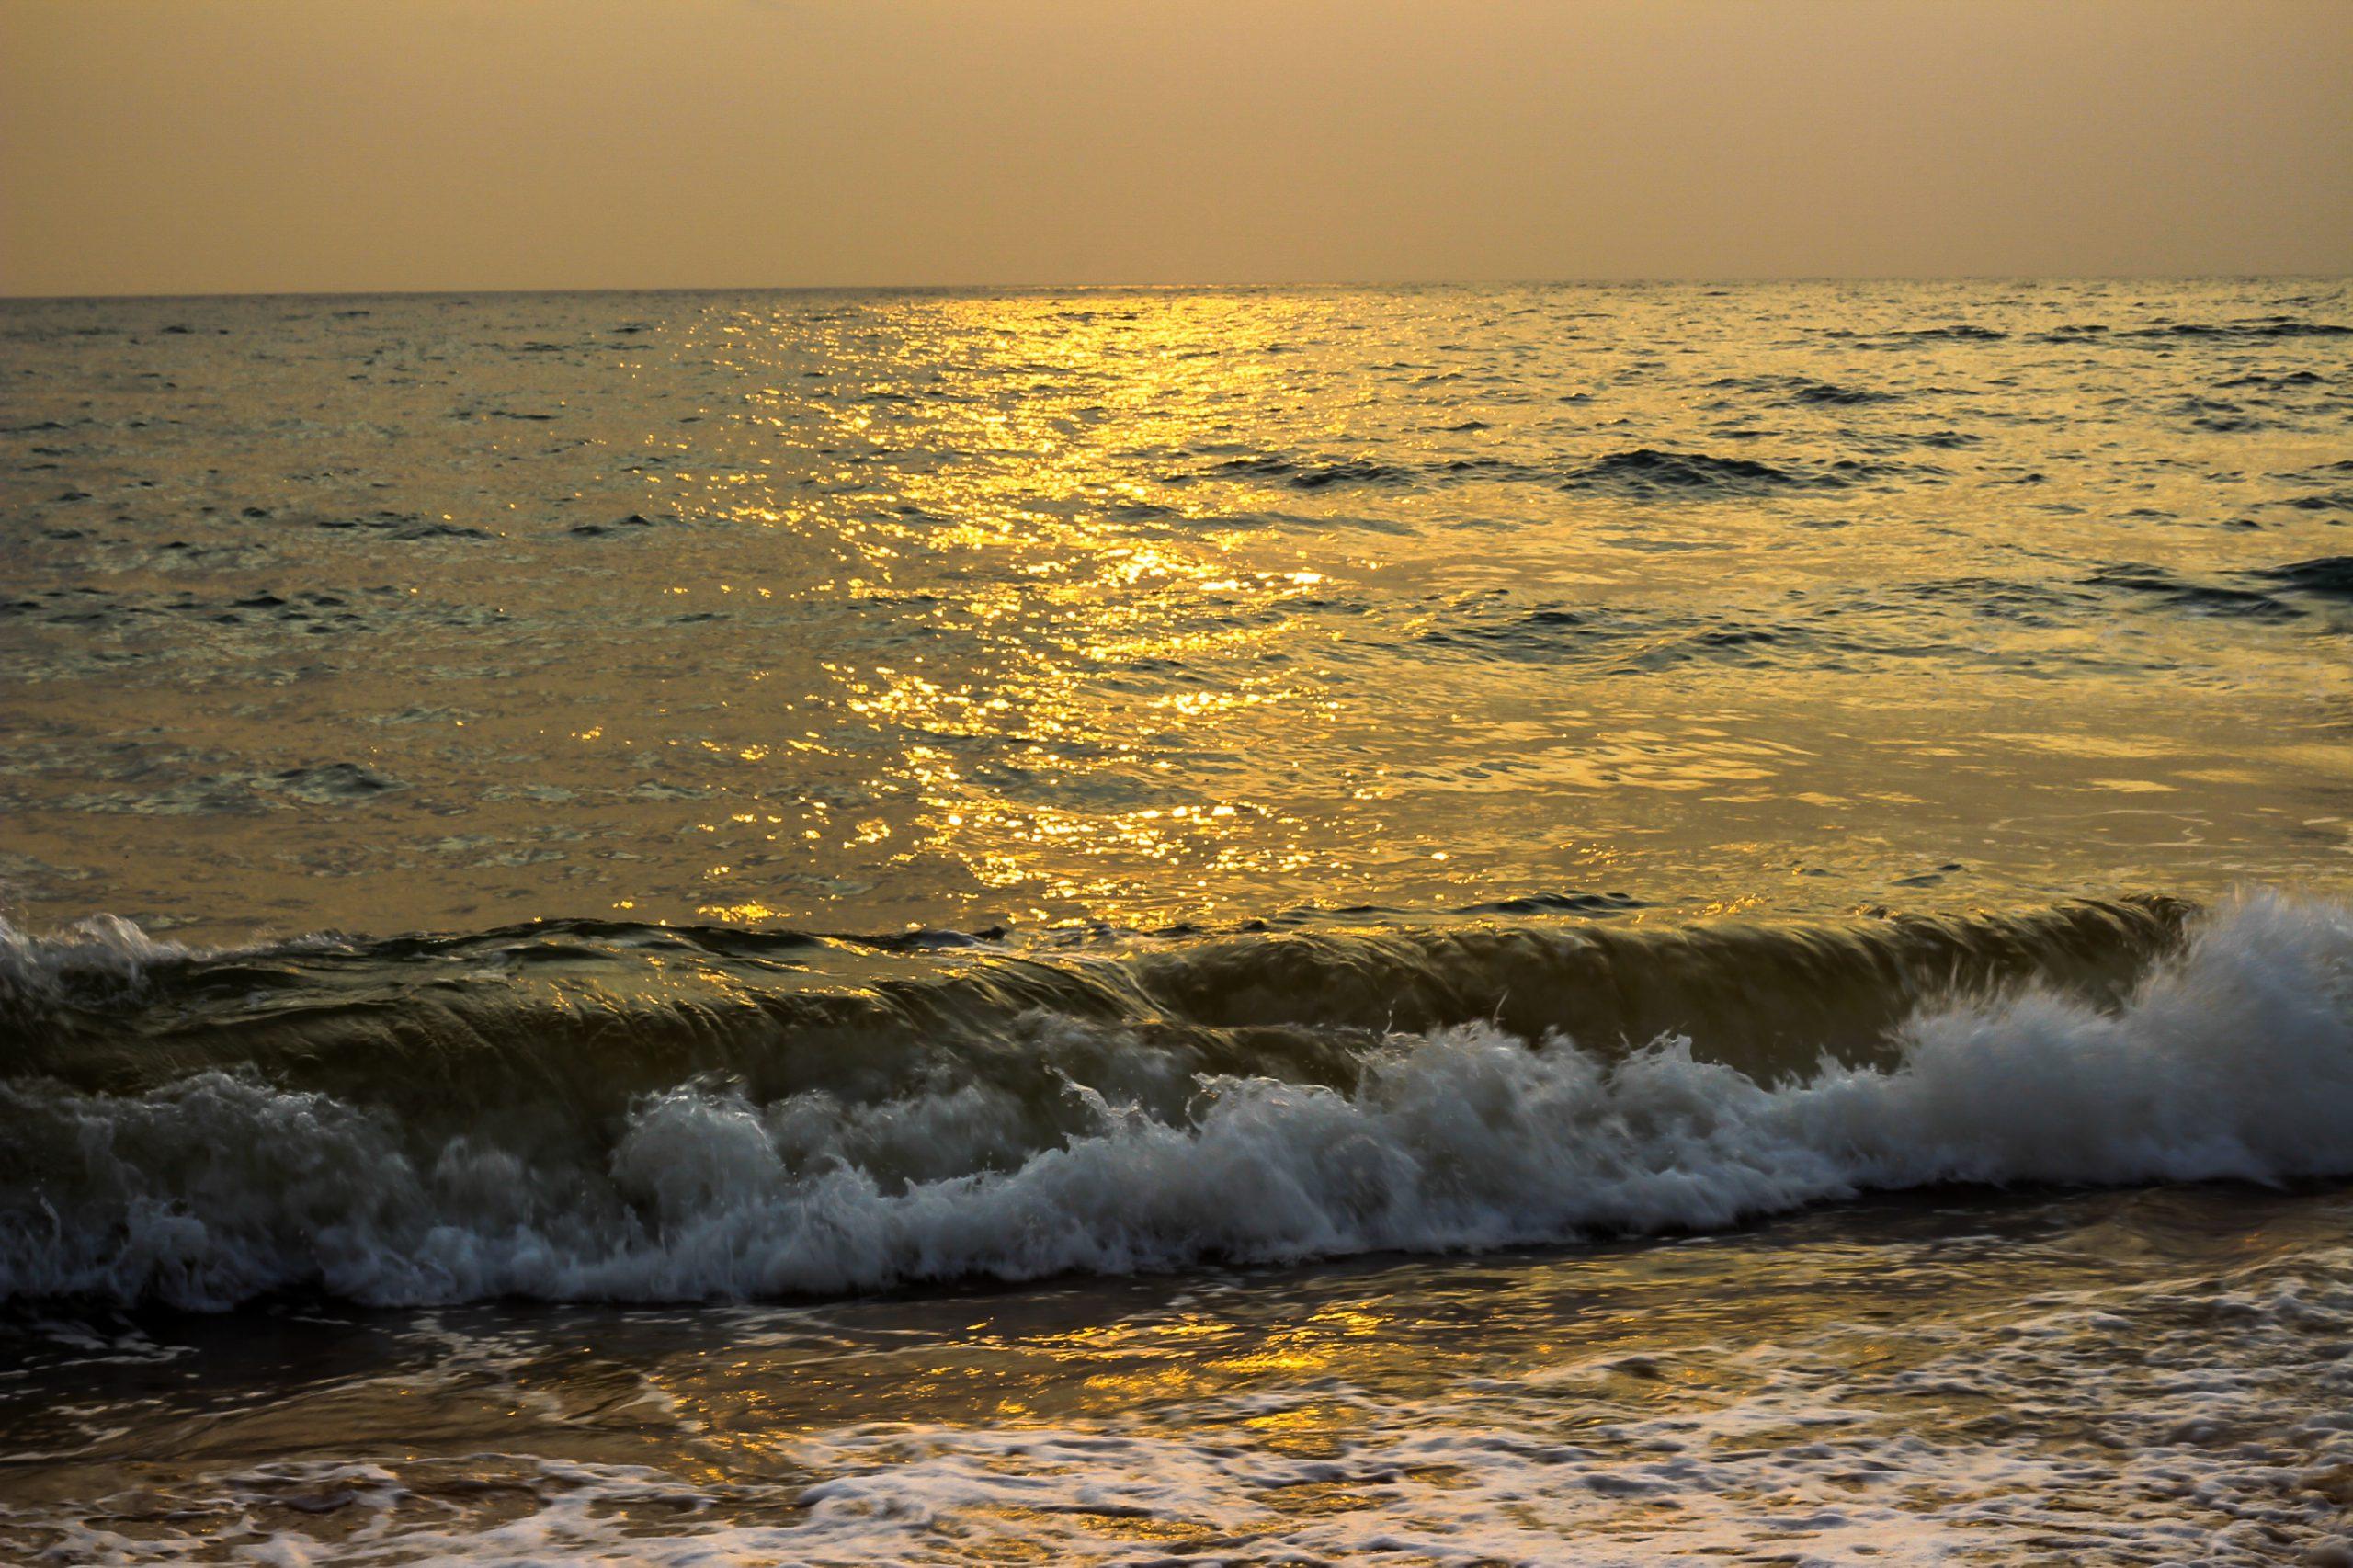 Beach water waves